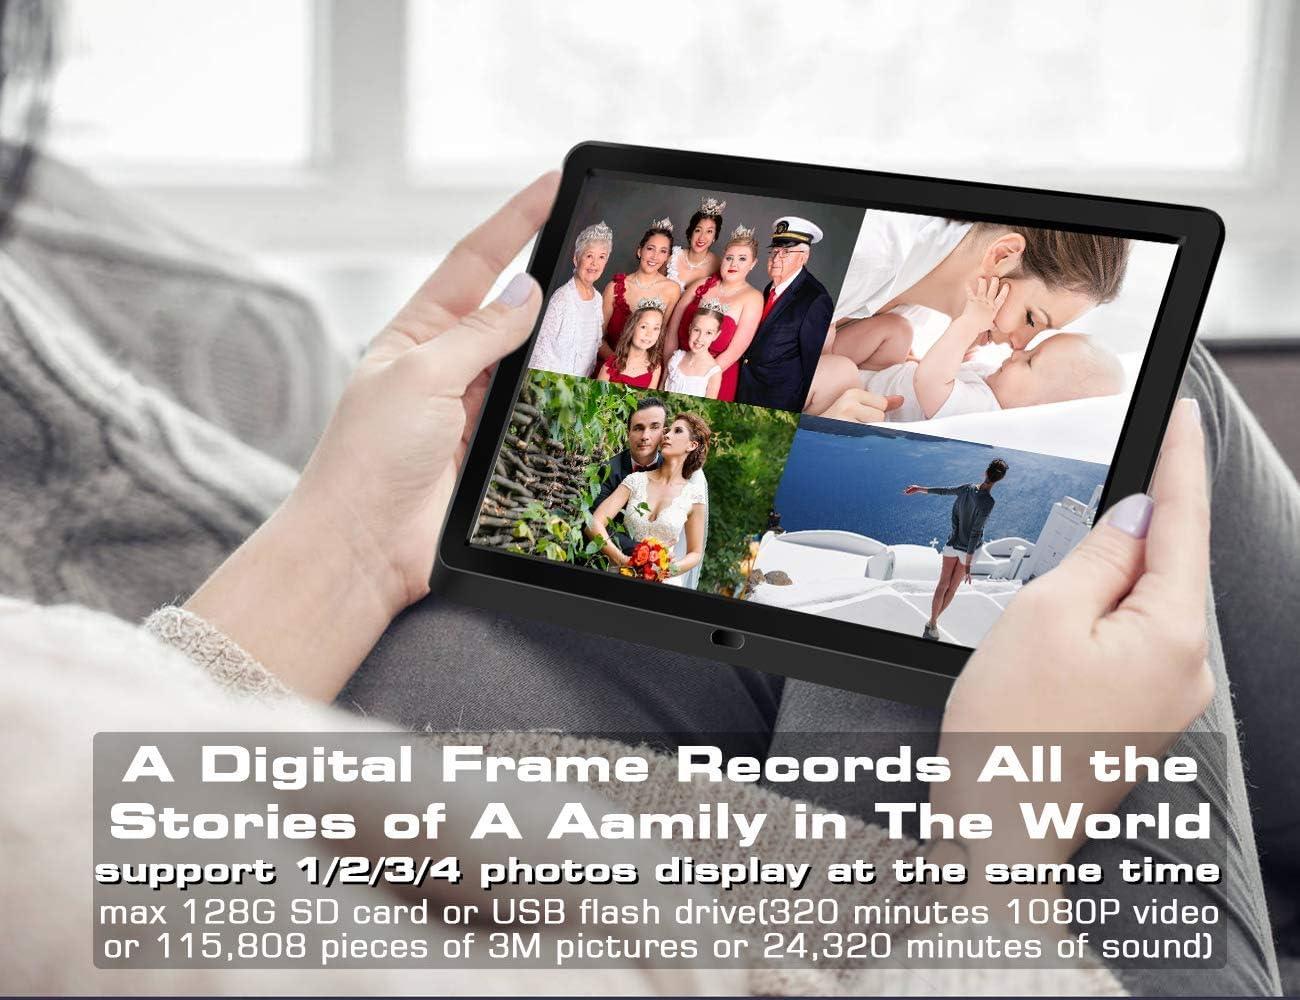 NAPATEK Digital Photo Frame 16:9 1920x1080 IPS Display 1080P FHD Video Playback Music Calendar Alarm Remote Control Support 128G SD-Black 8 Inch Digital Picture Frame